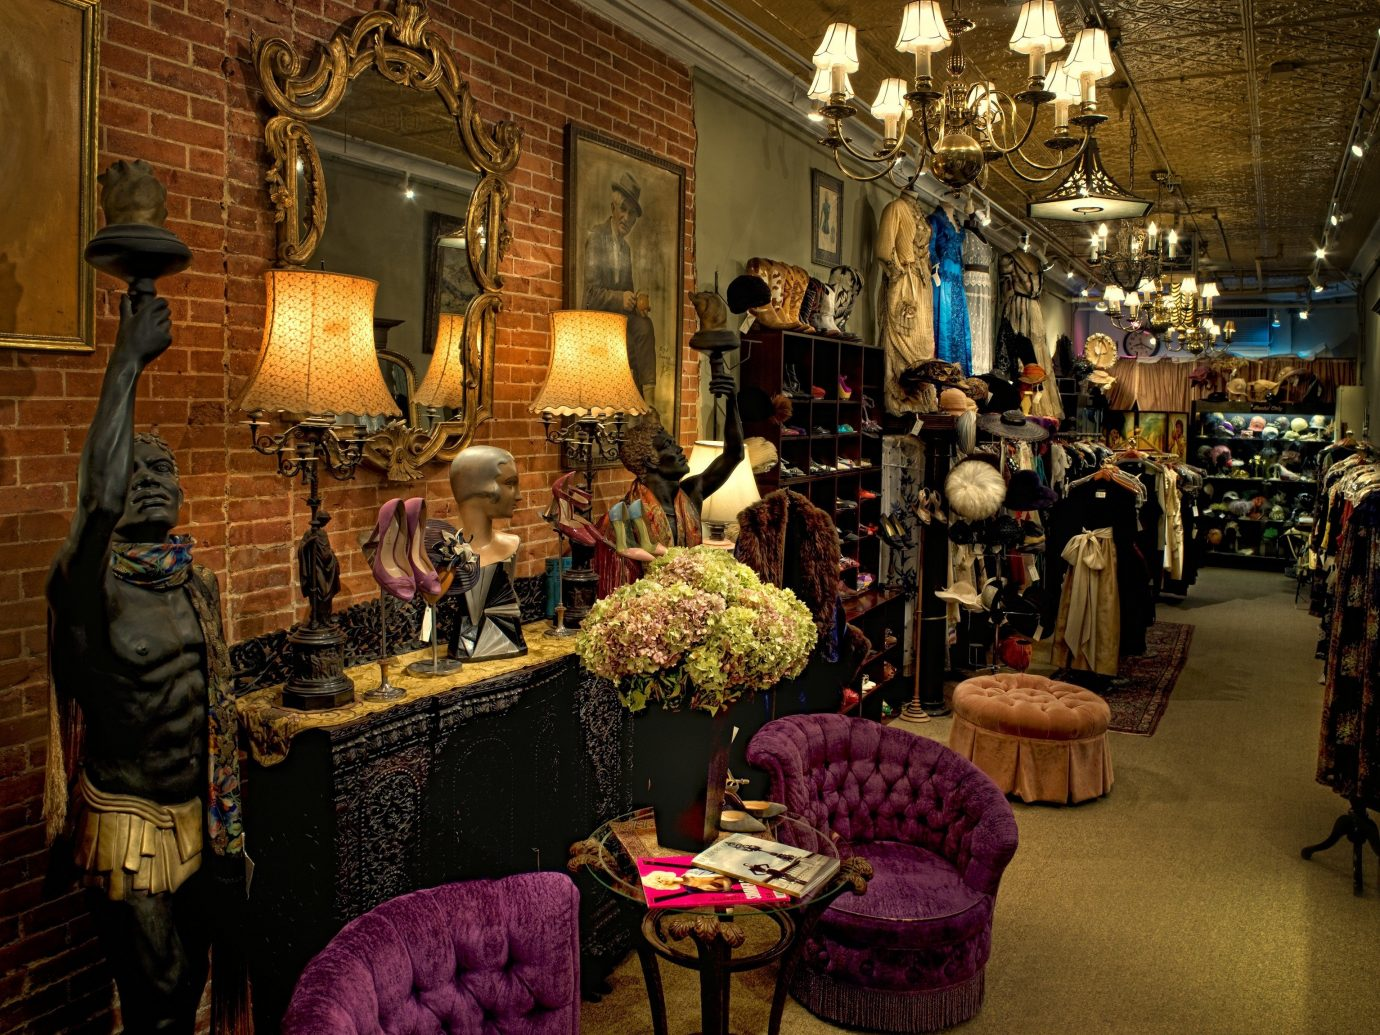 NYC Shops Style + Design indoor room bazaar interior design furniture several